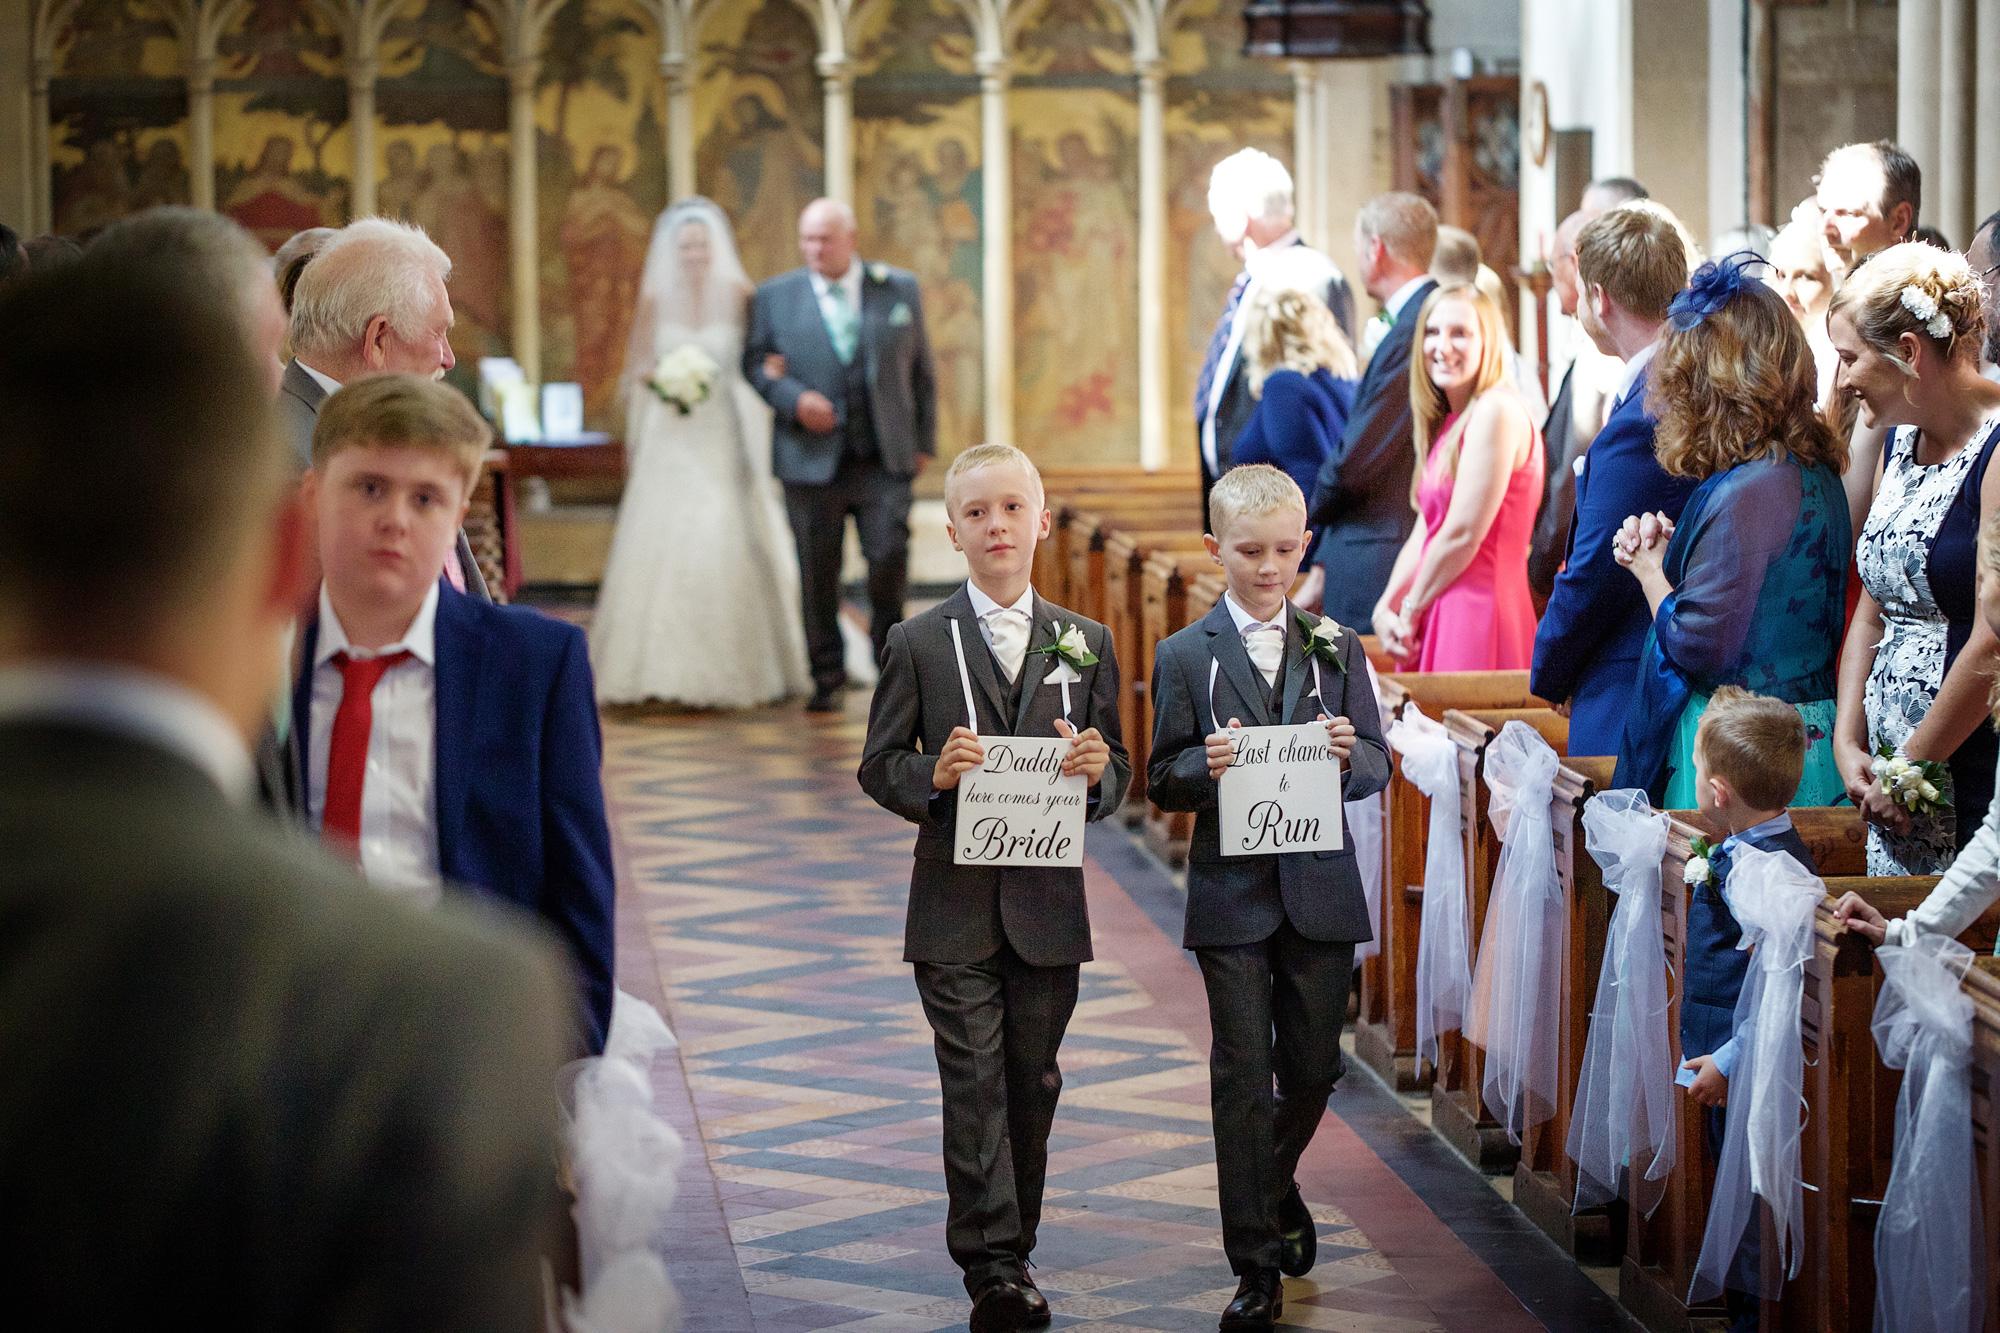 Adam_Hillier_Wedding_Photographer_Newbury_Berkshire_1 (3).jpg